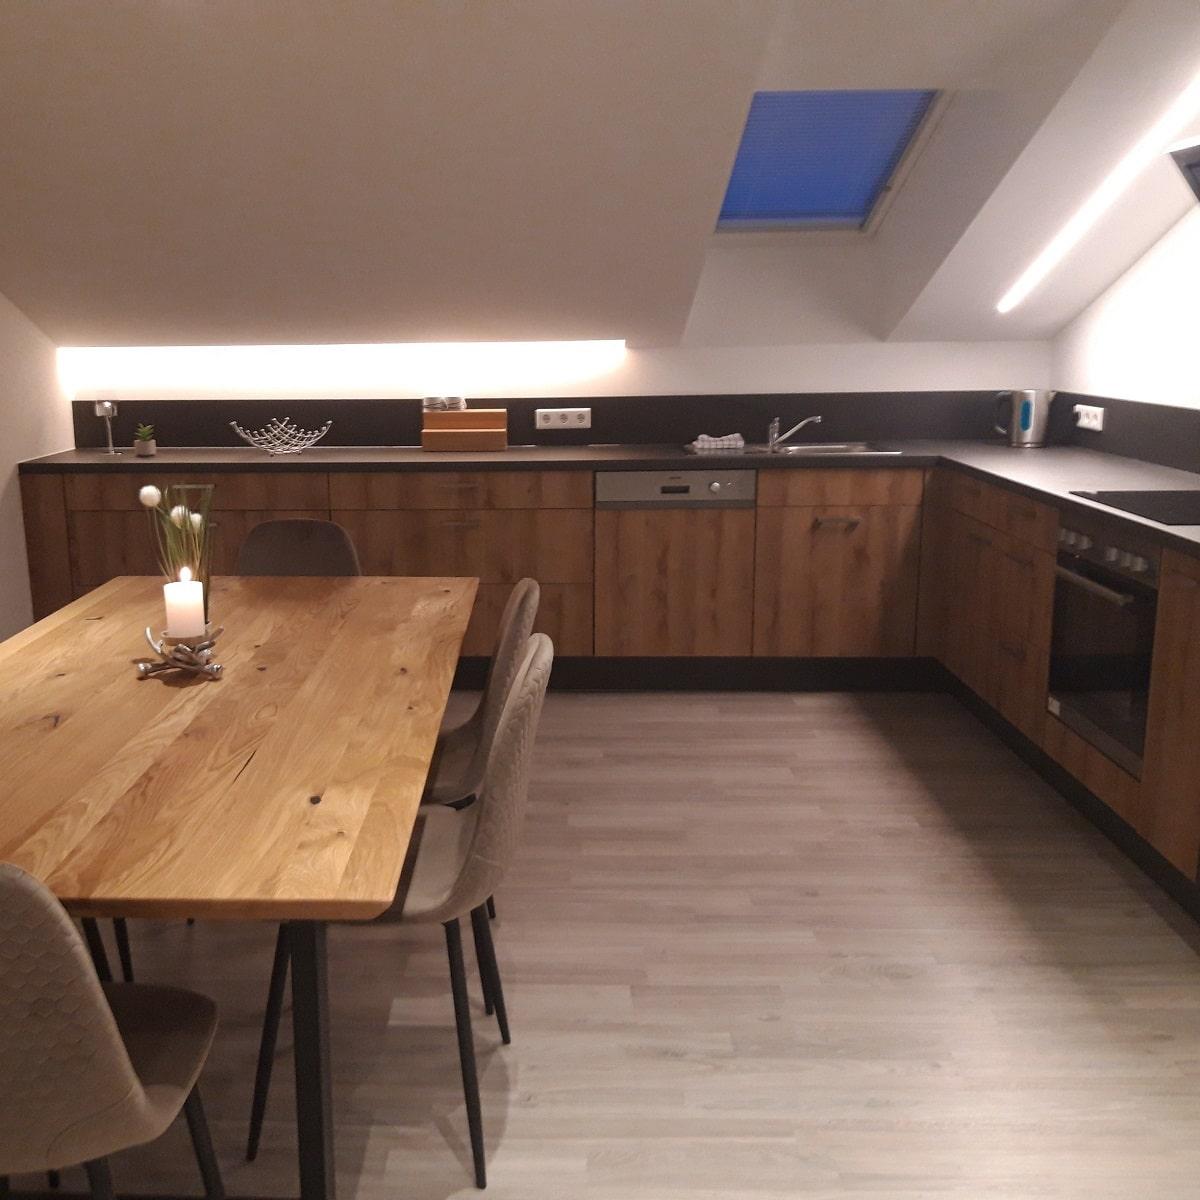 LED-Stripes Küchenbeleuchtung